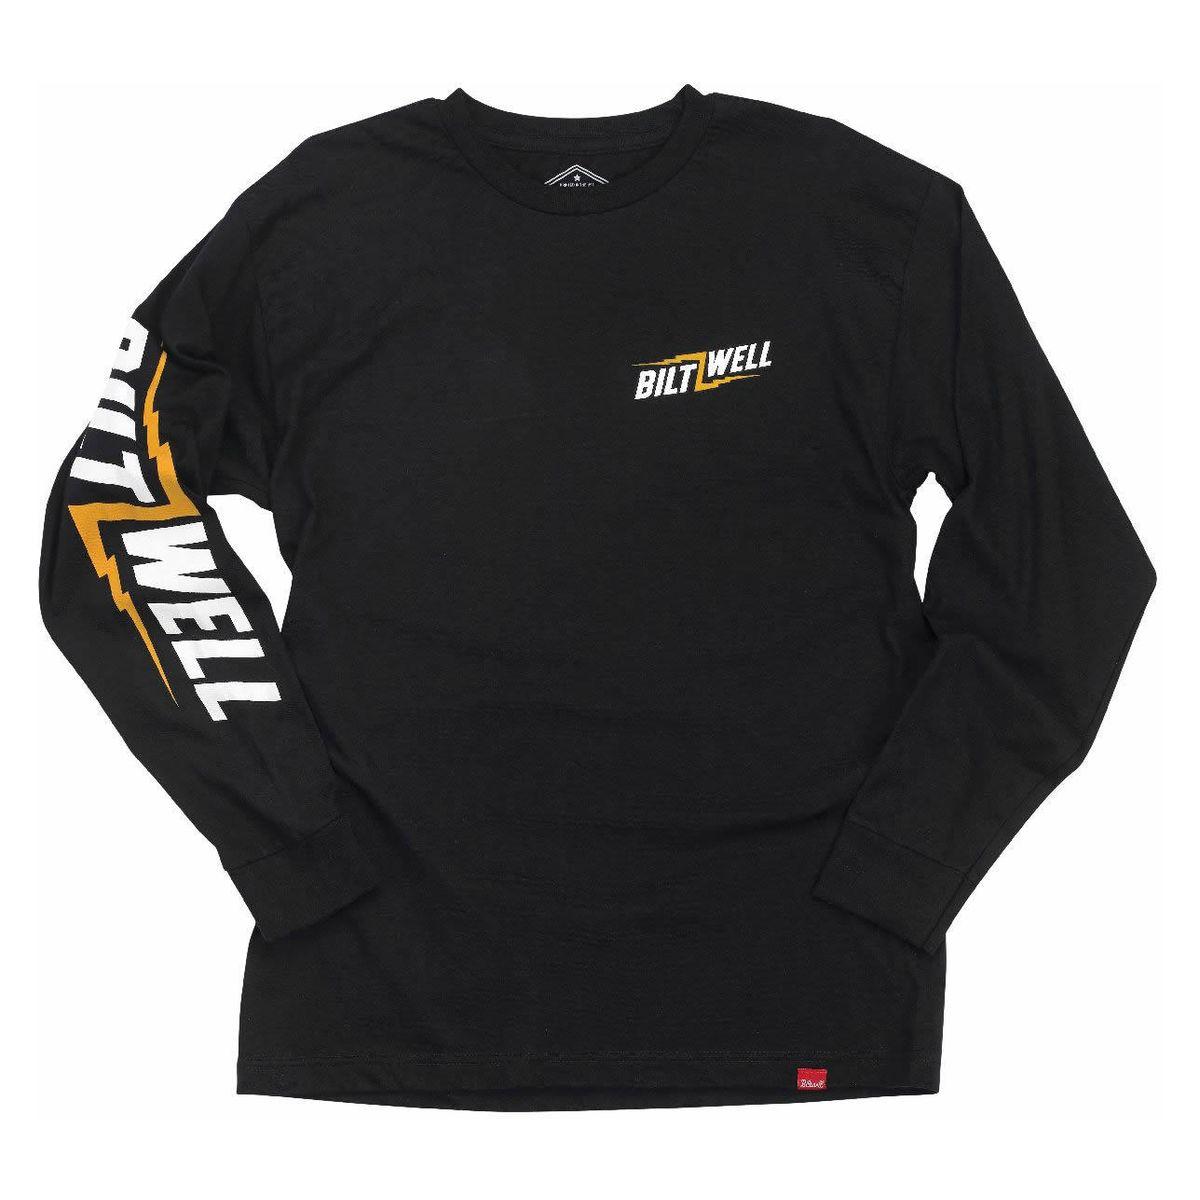 Biltwell Bolt Motorbike Motorcycle T-Shirt Black